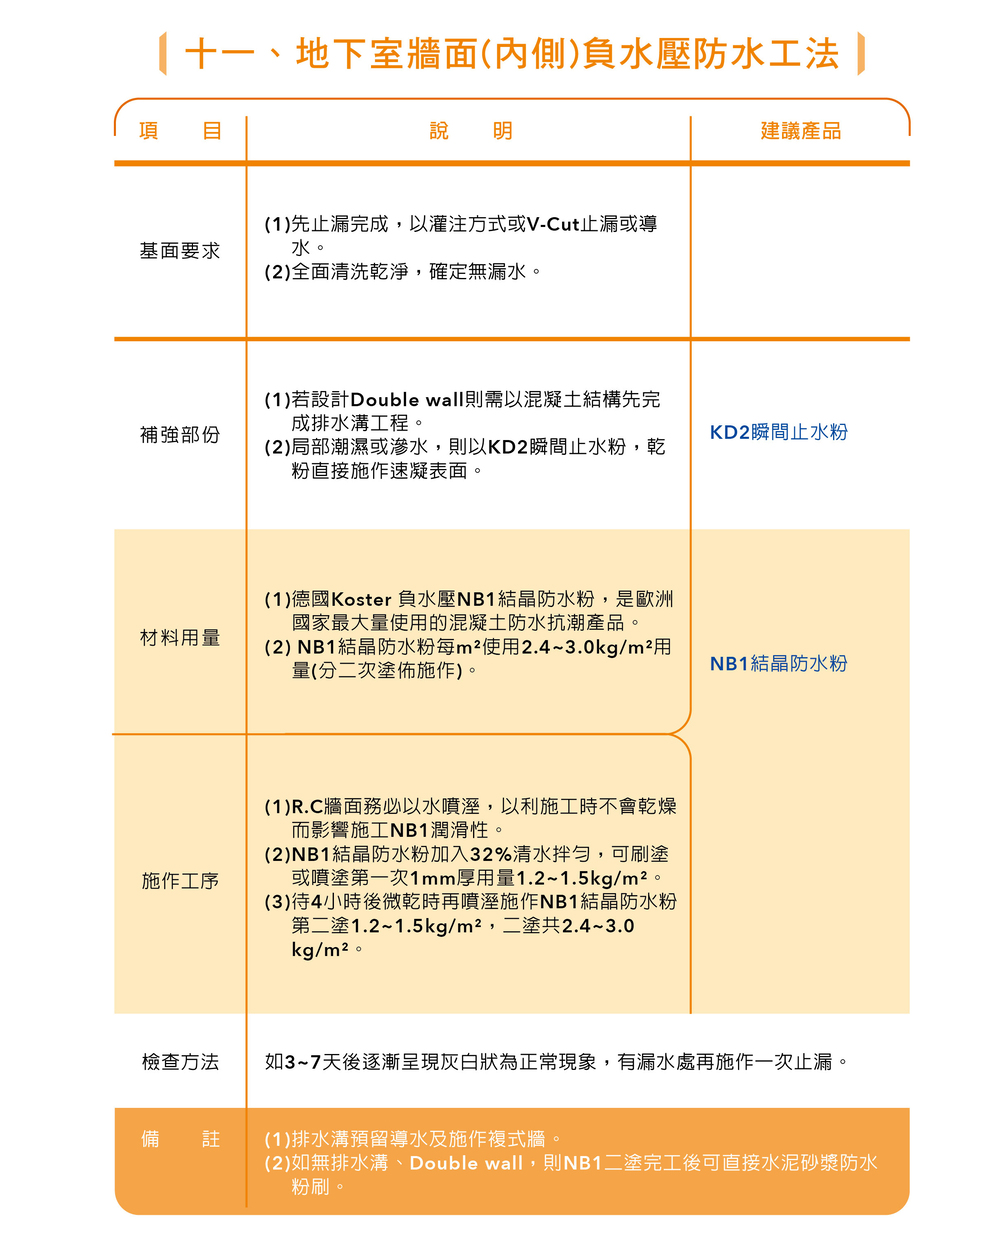 https://www.miclon.com.tw/images/webimg/medium/210305035538.jpeg